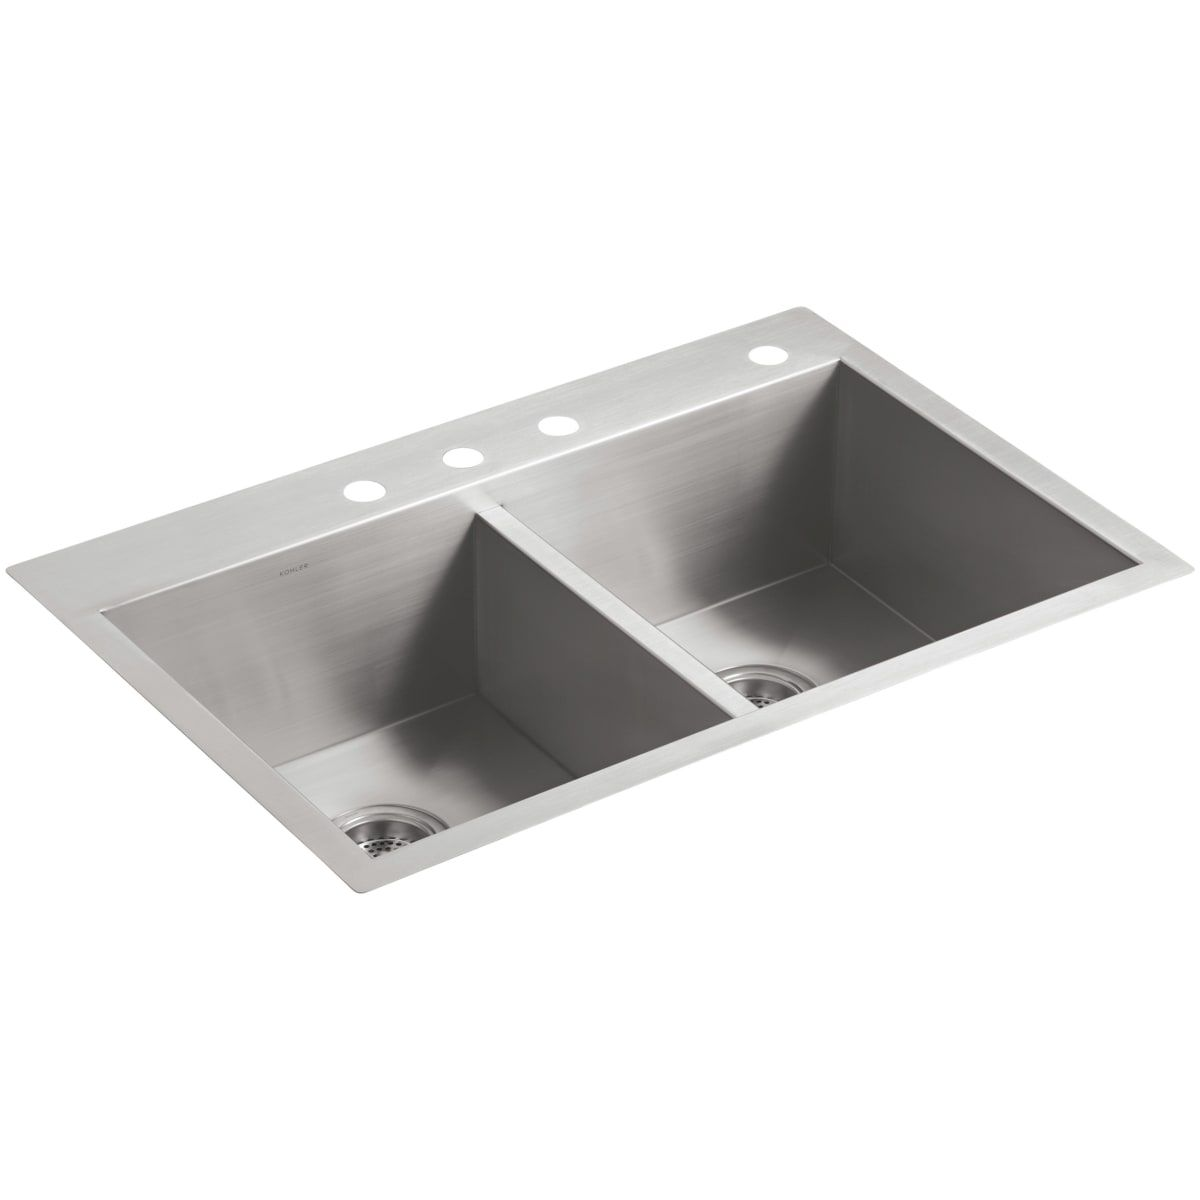 Kohler K 3820 4 Double Bowl Kitchen Sink Sink Stainless Steel